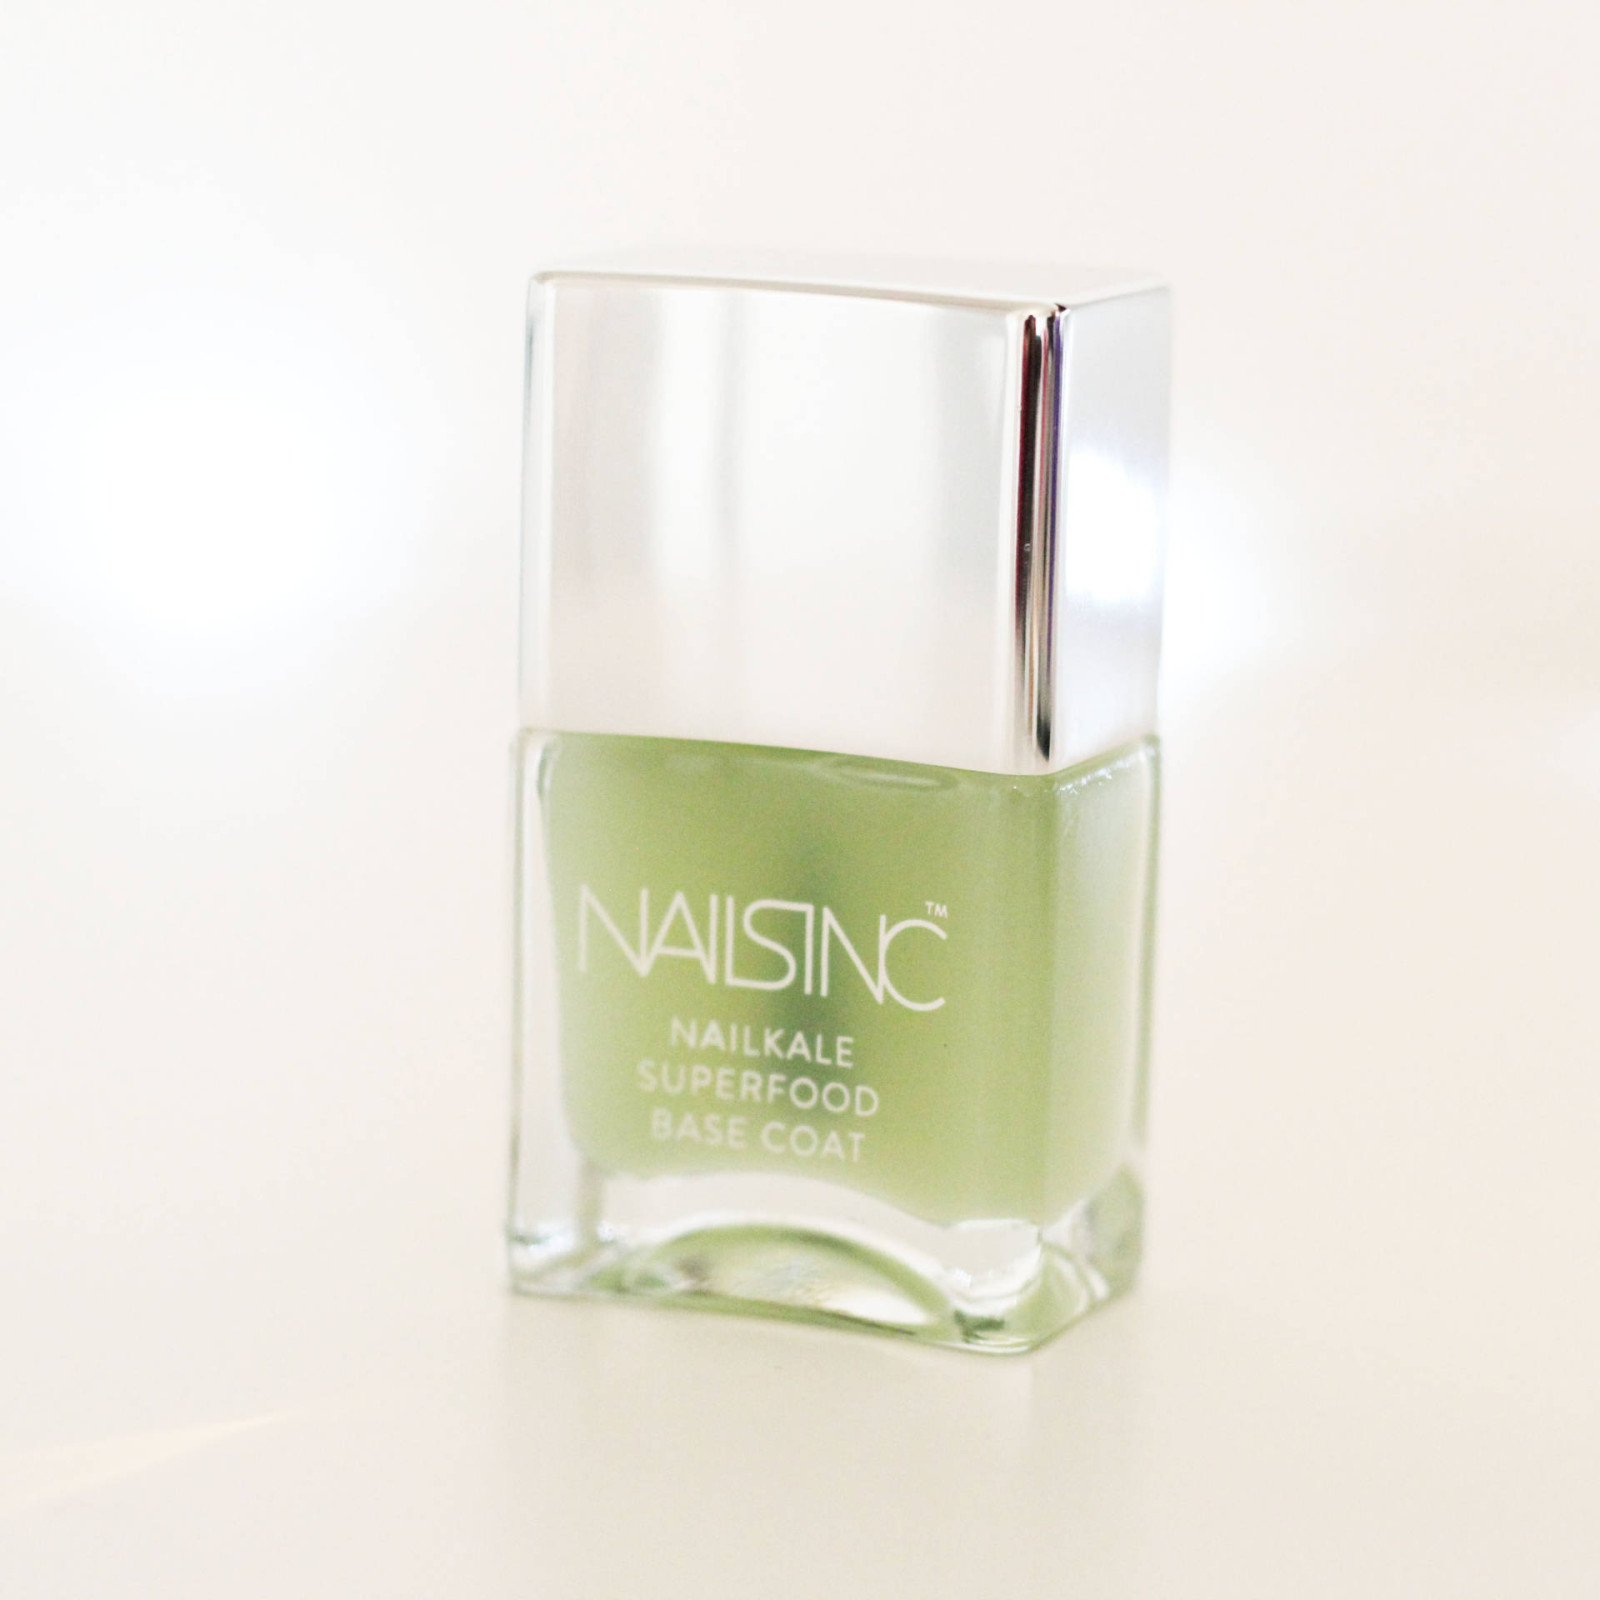 Nails Inc Overnight Detox Mask With Green Tea, Acai and Spirulina